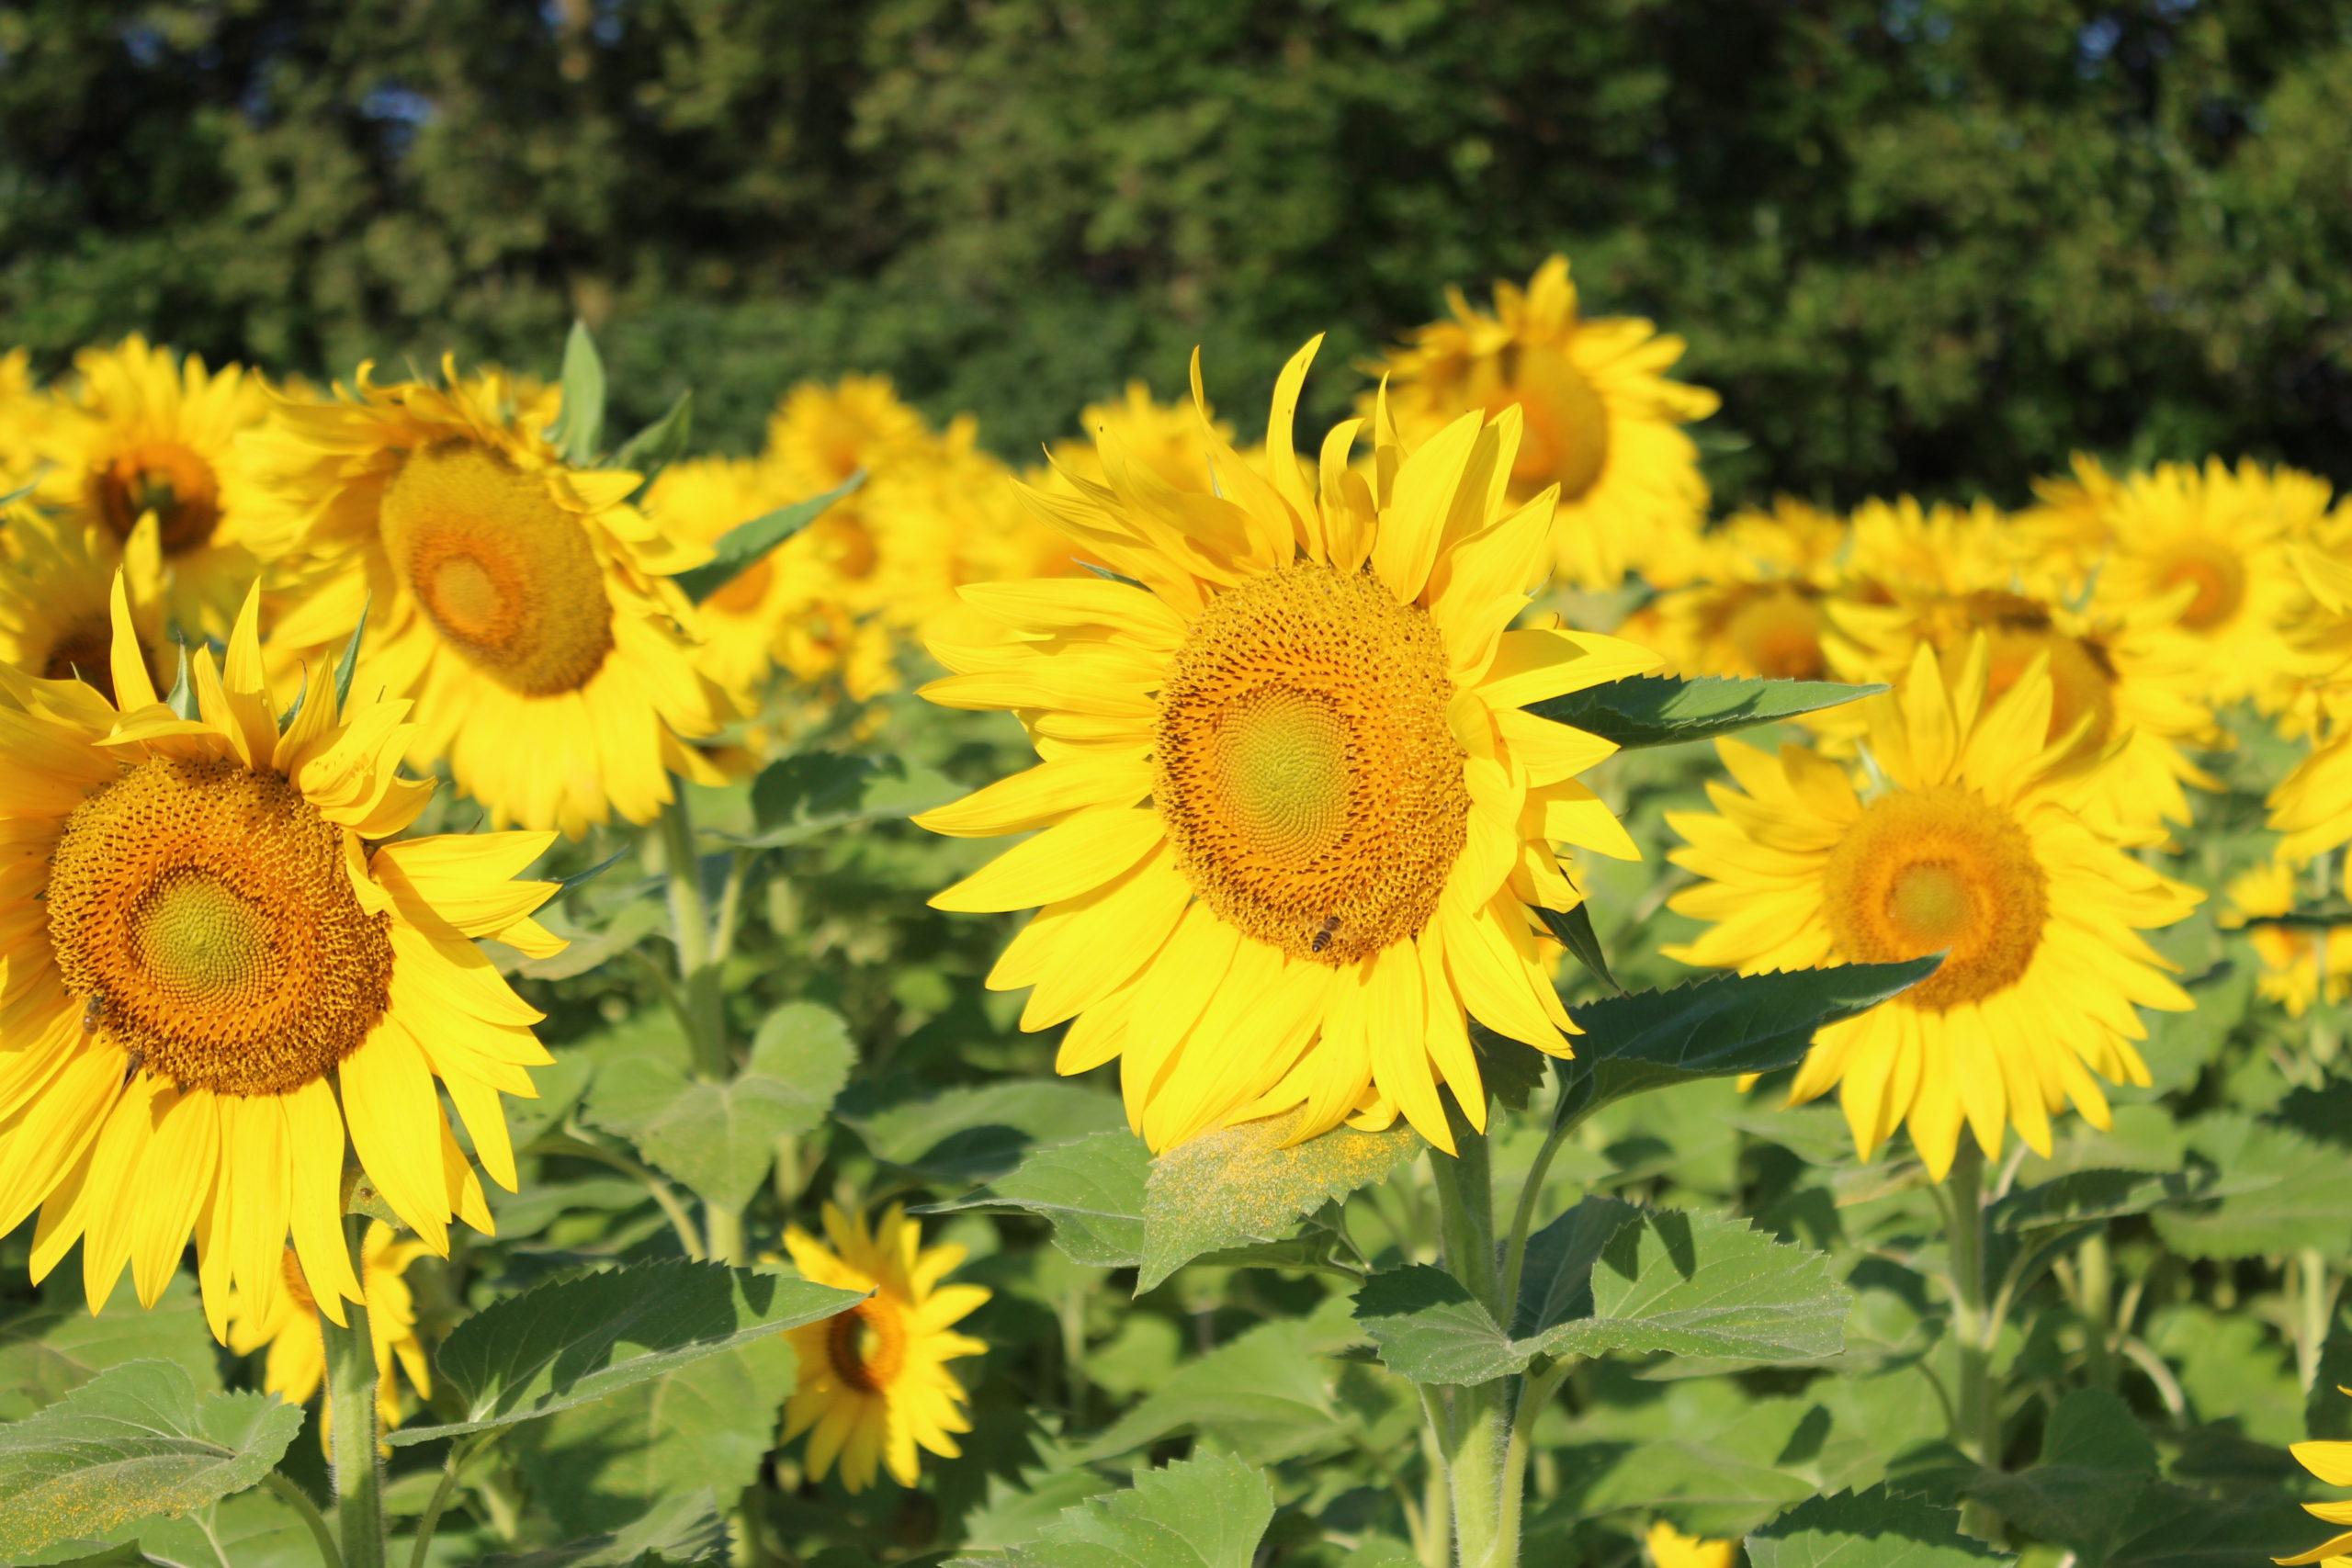 Sunfowers at Stone Creek